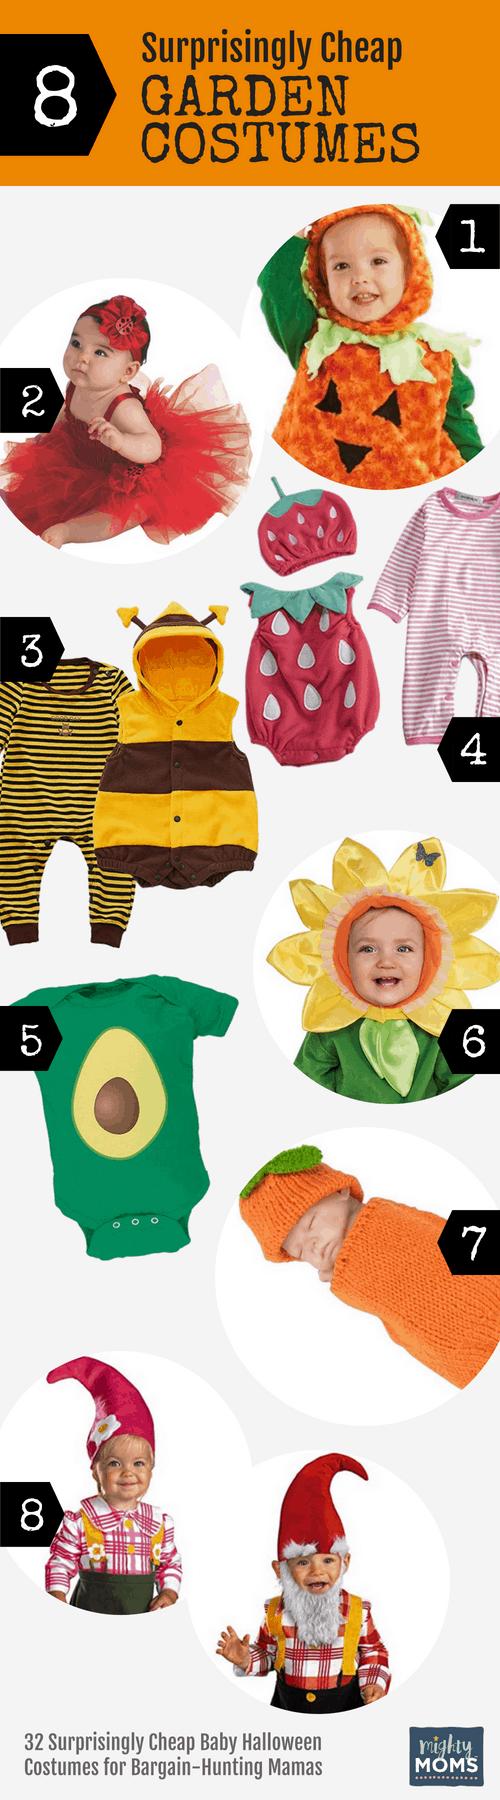 Cheap Garden Baby Halloween Costumes - MightyMoms.club